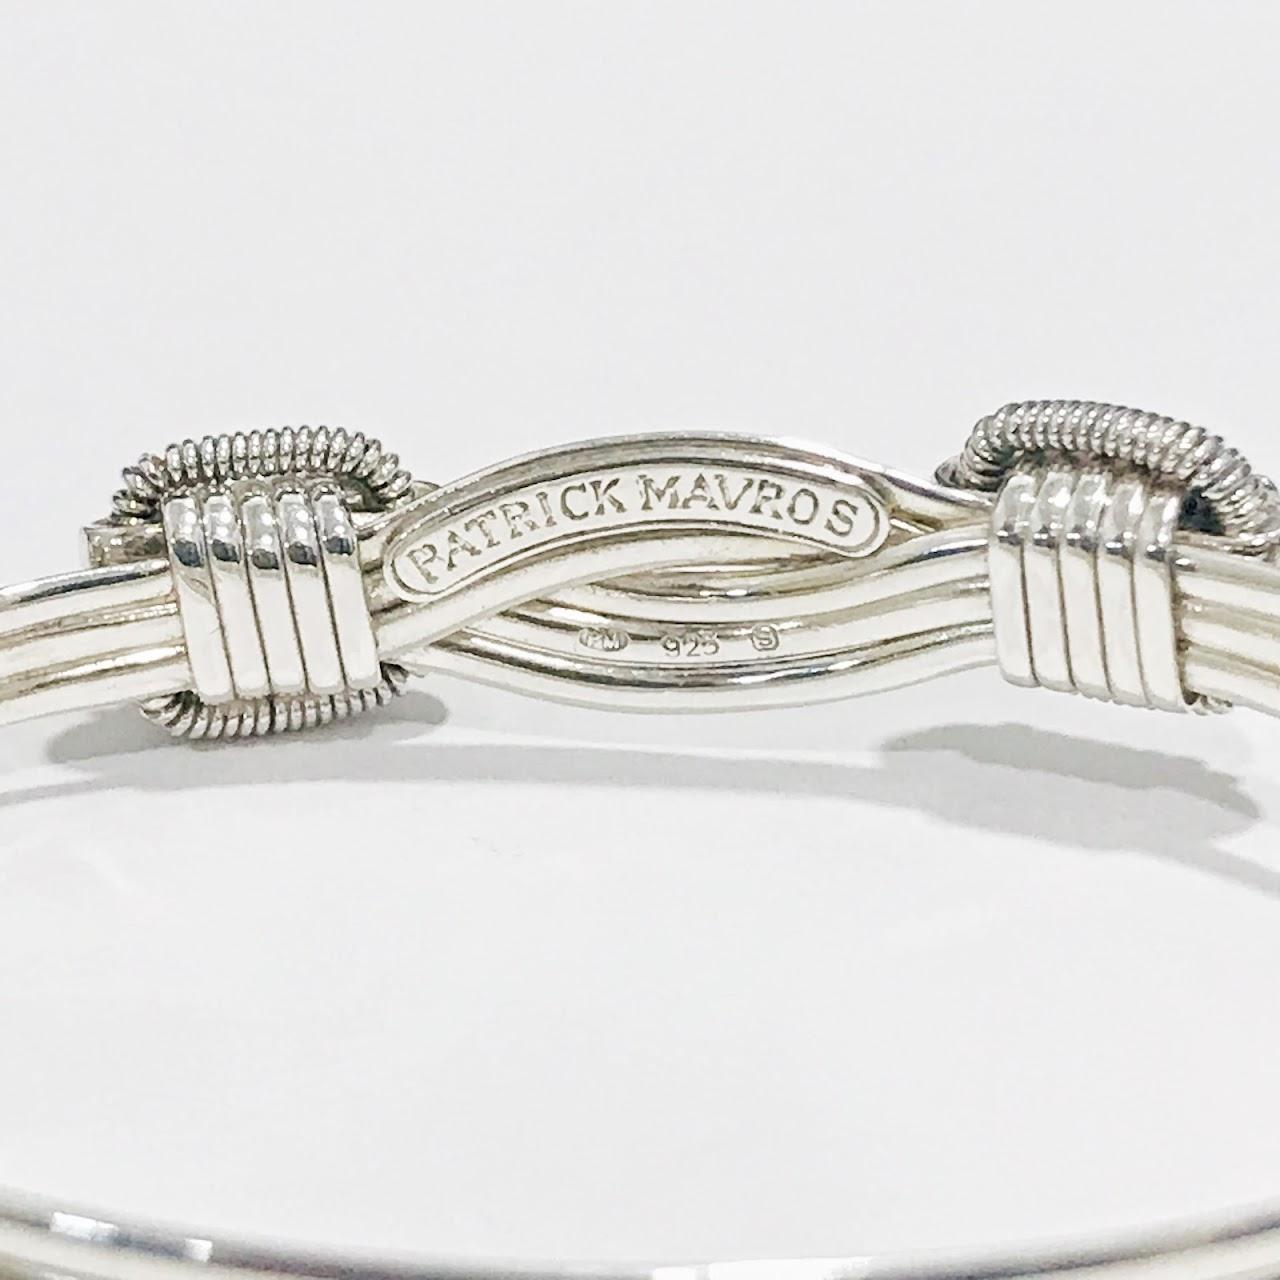 Patrick Mavros Sterling Silver Elephant Hair Bangle